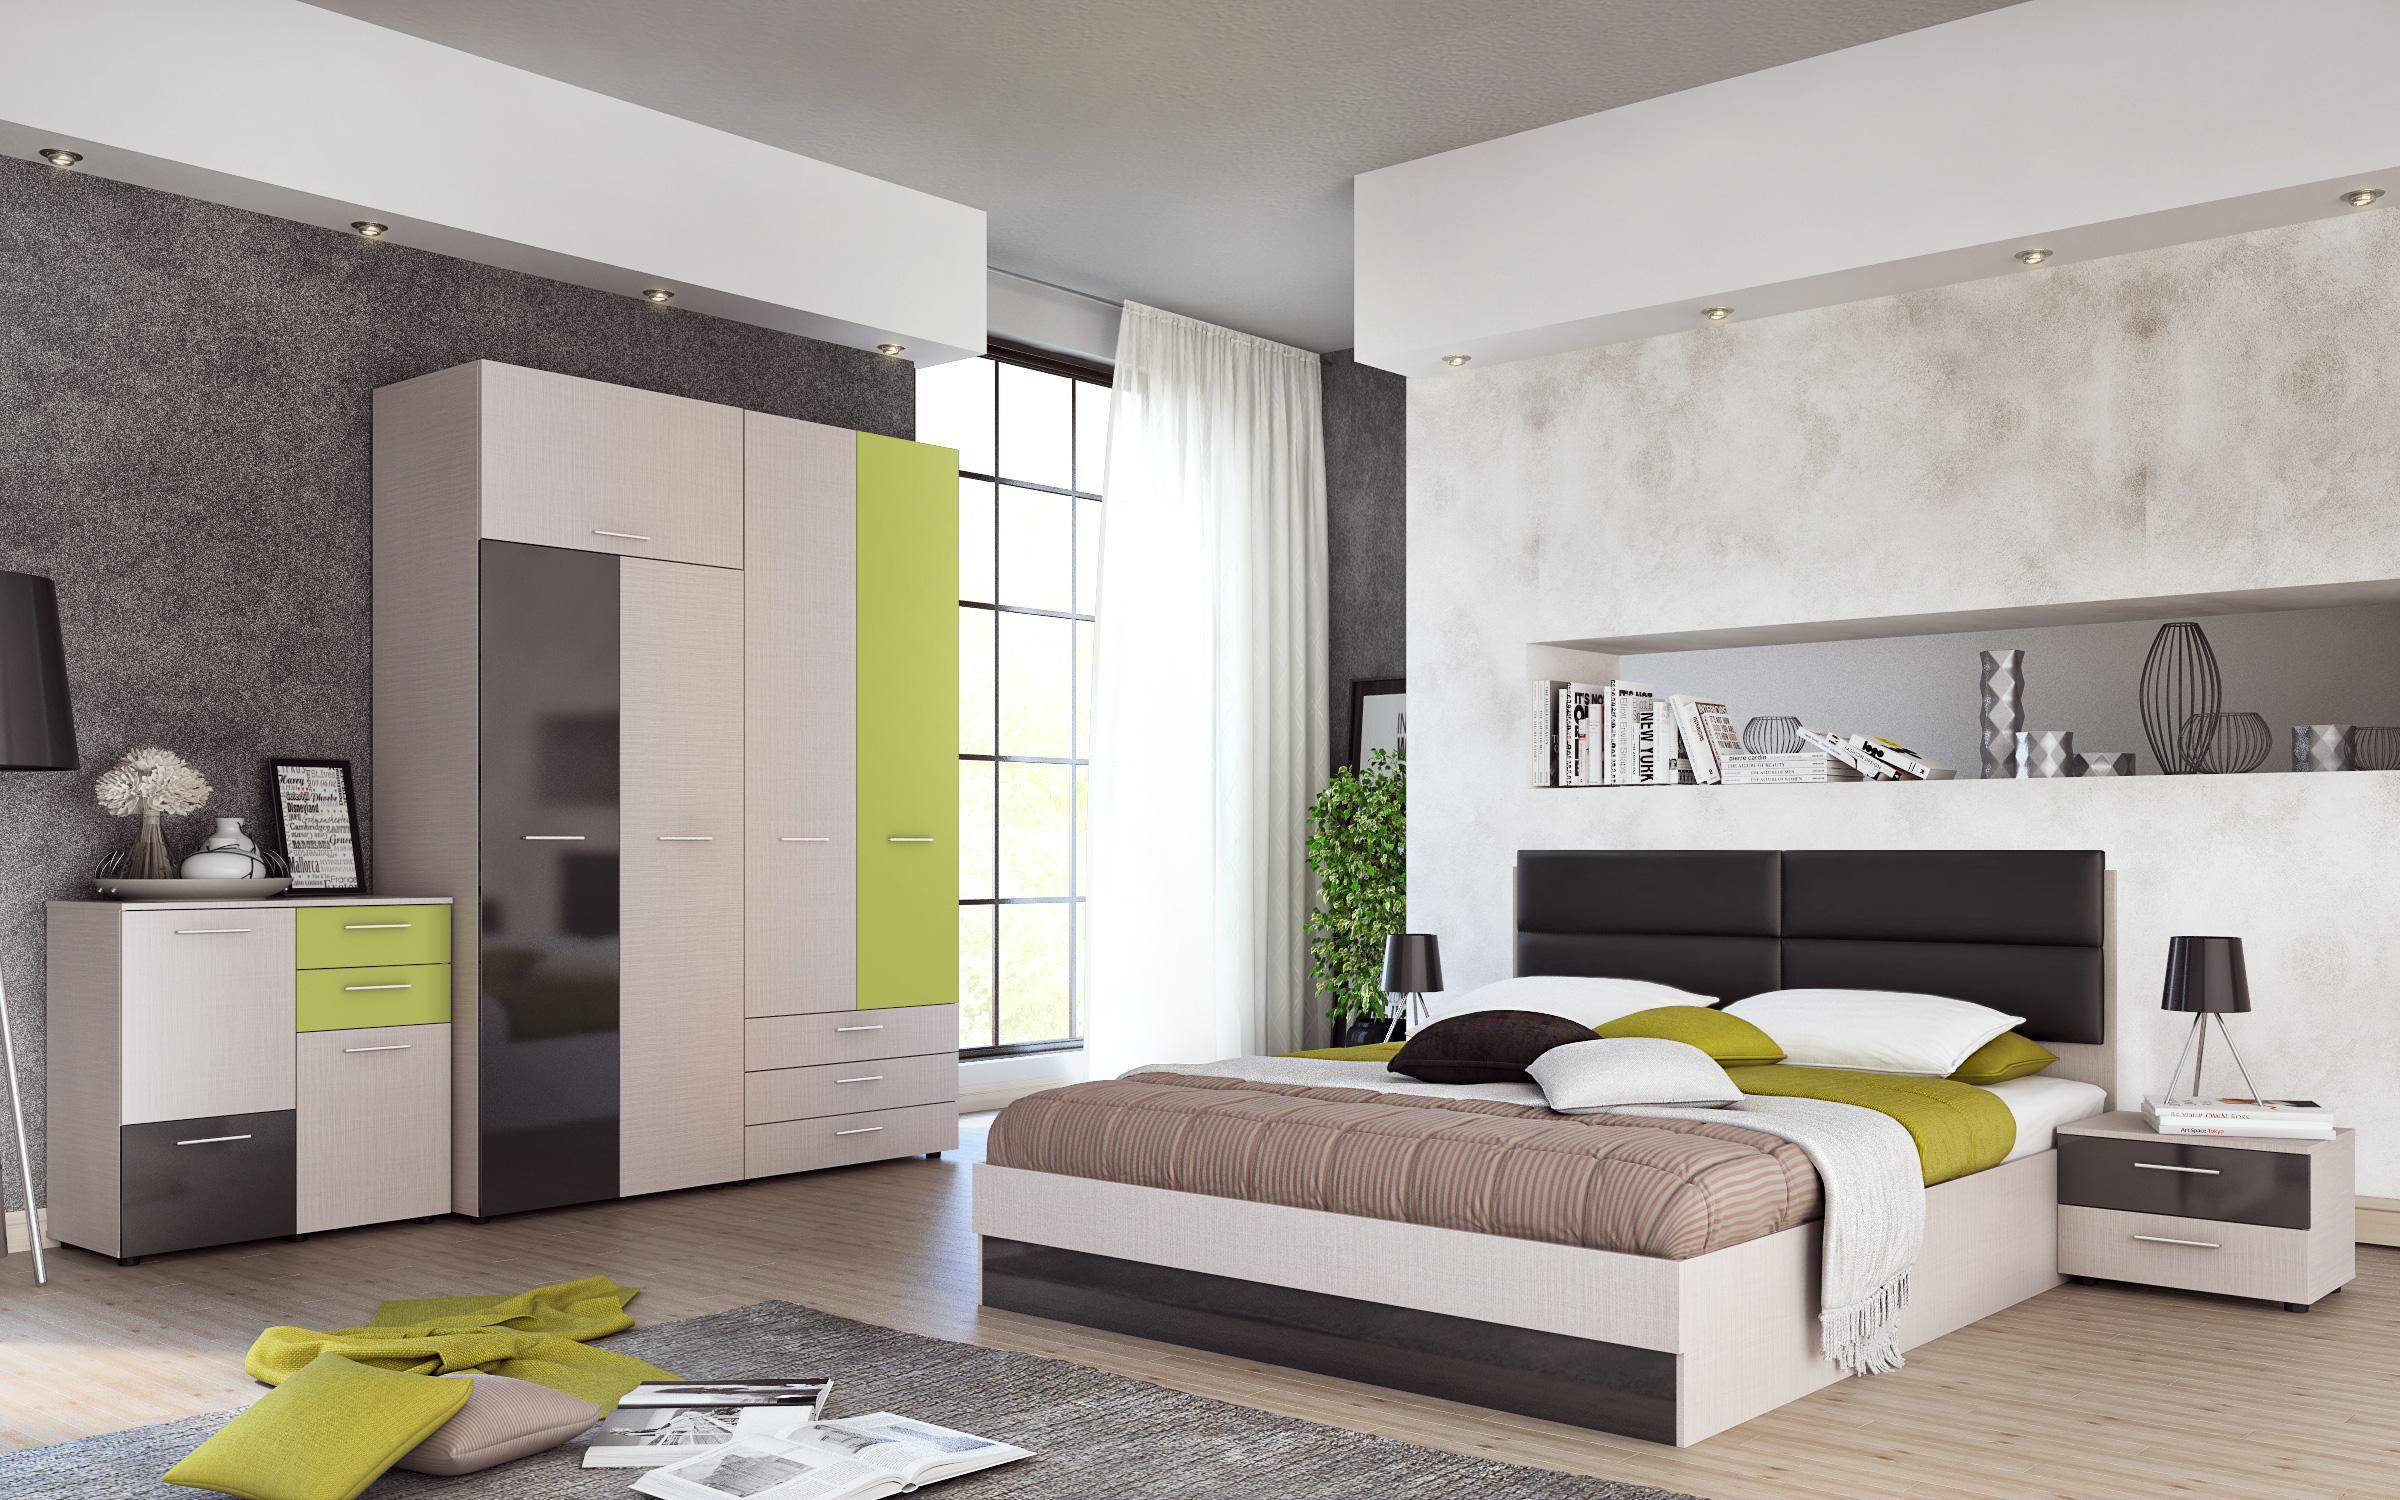 Спален комплект Фабиано II , светъл периер + антрацит гланц и зелен океан